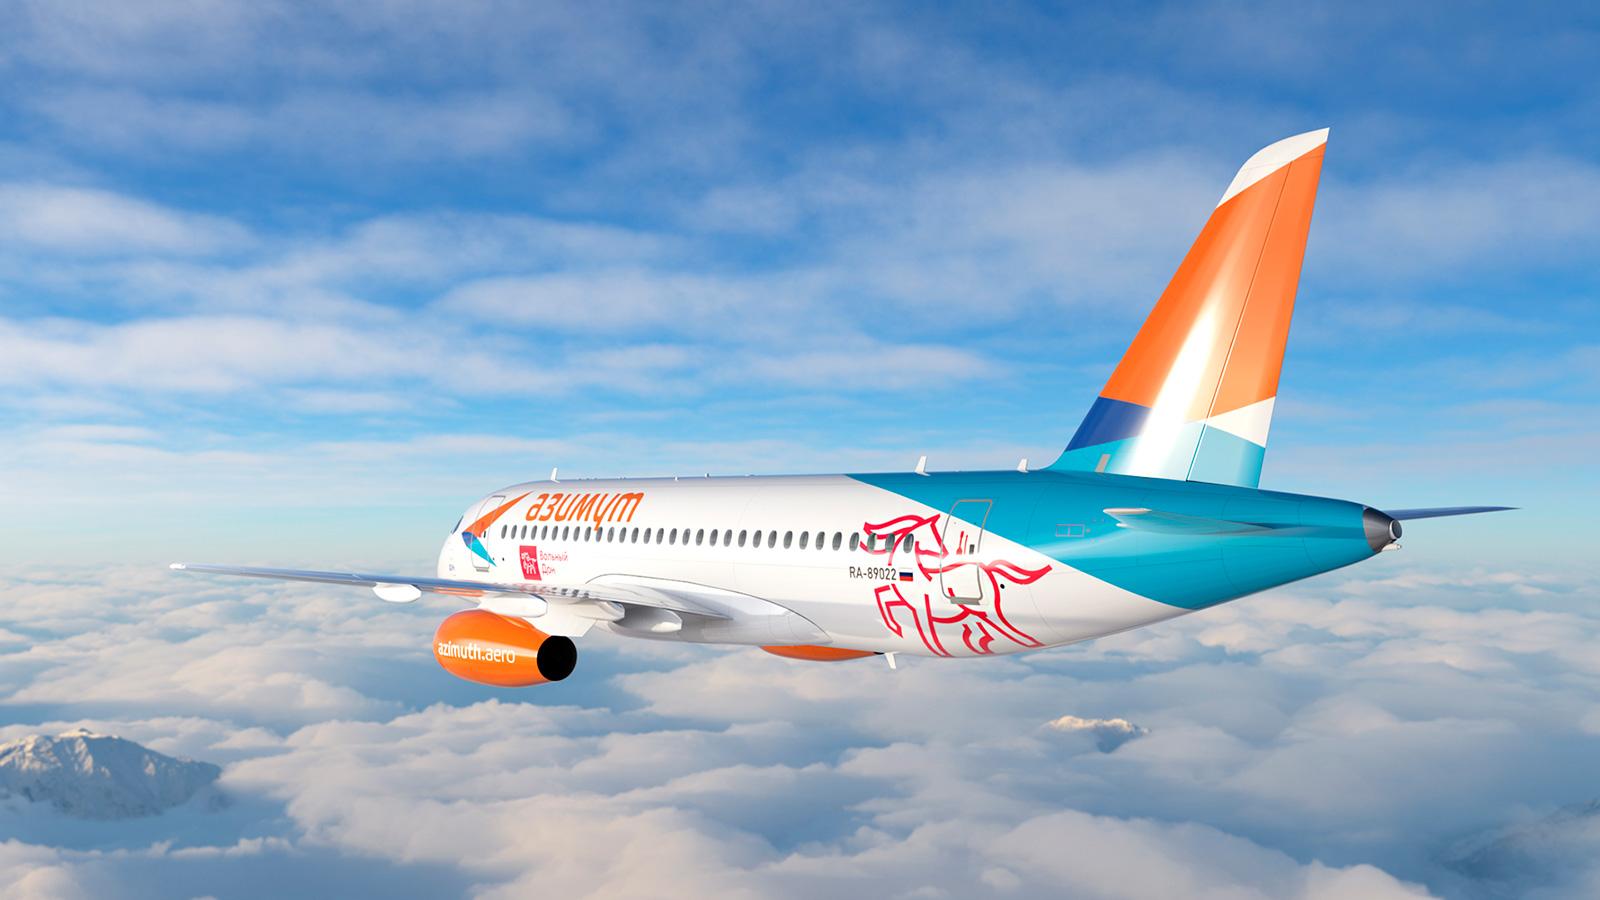 Кобрендинг авиакомпании Азимут и туристического бренда Вольный Дон